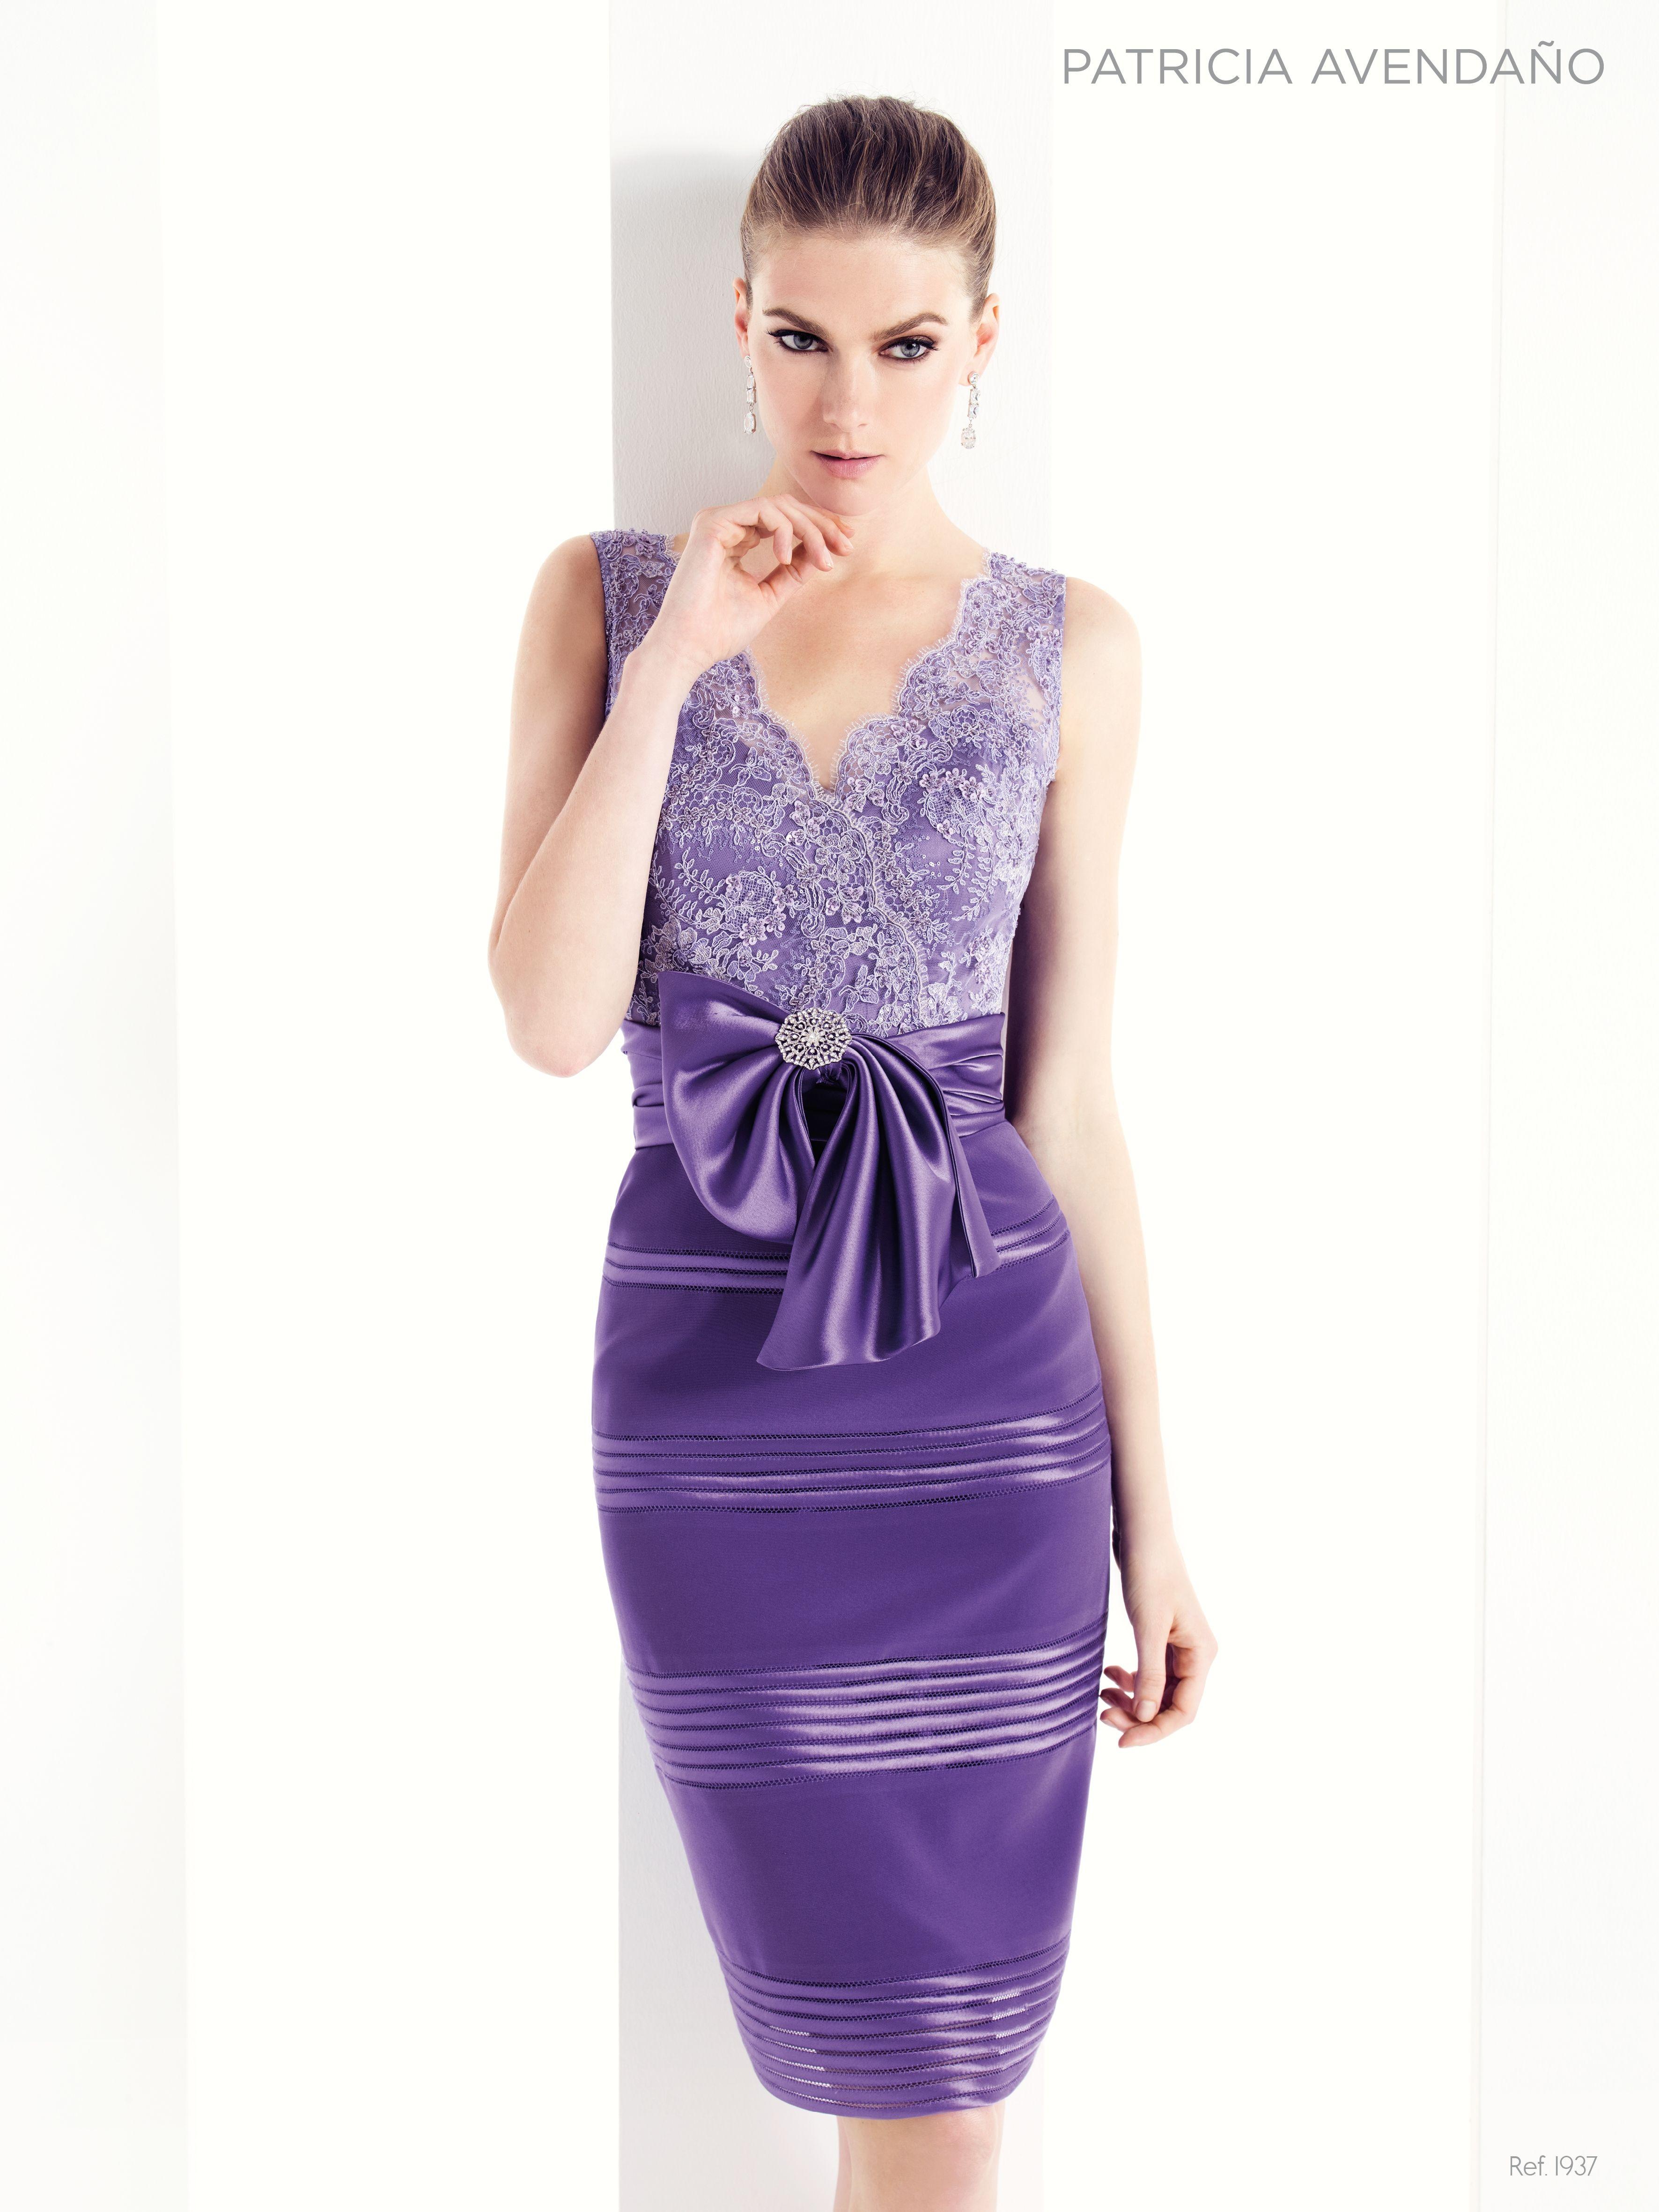 1937 - Vestido de Fiesta - Patricia Avendaño | Short Dresses ...